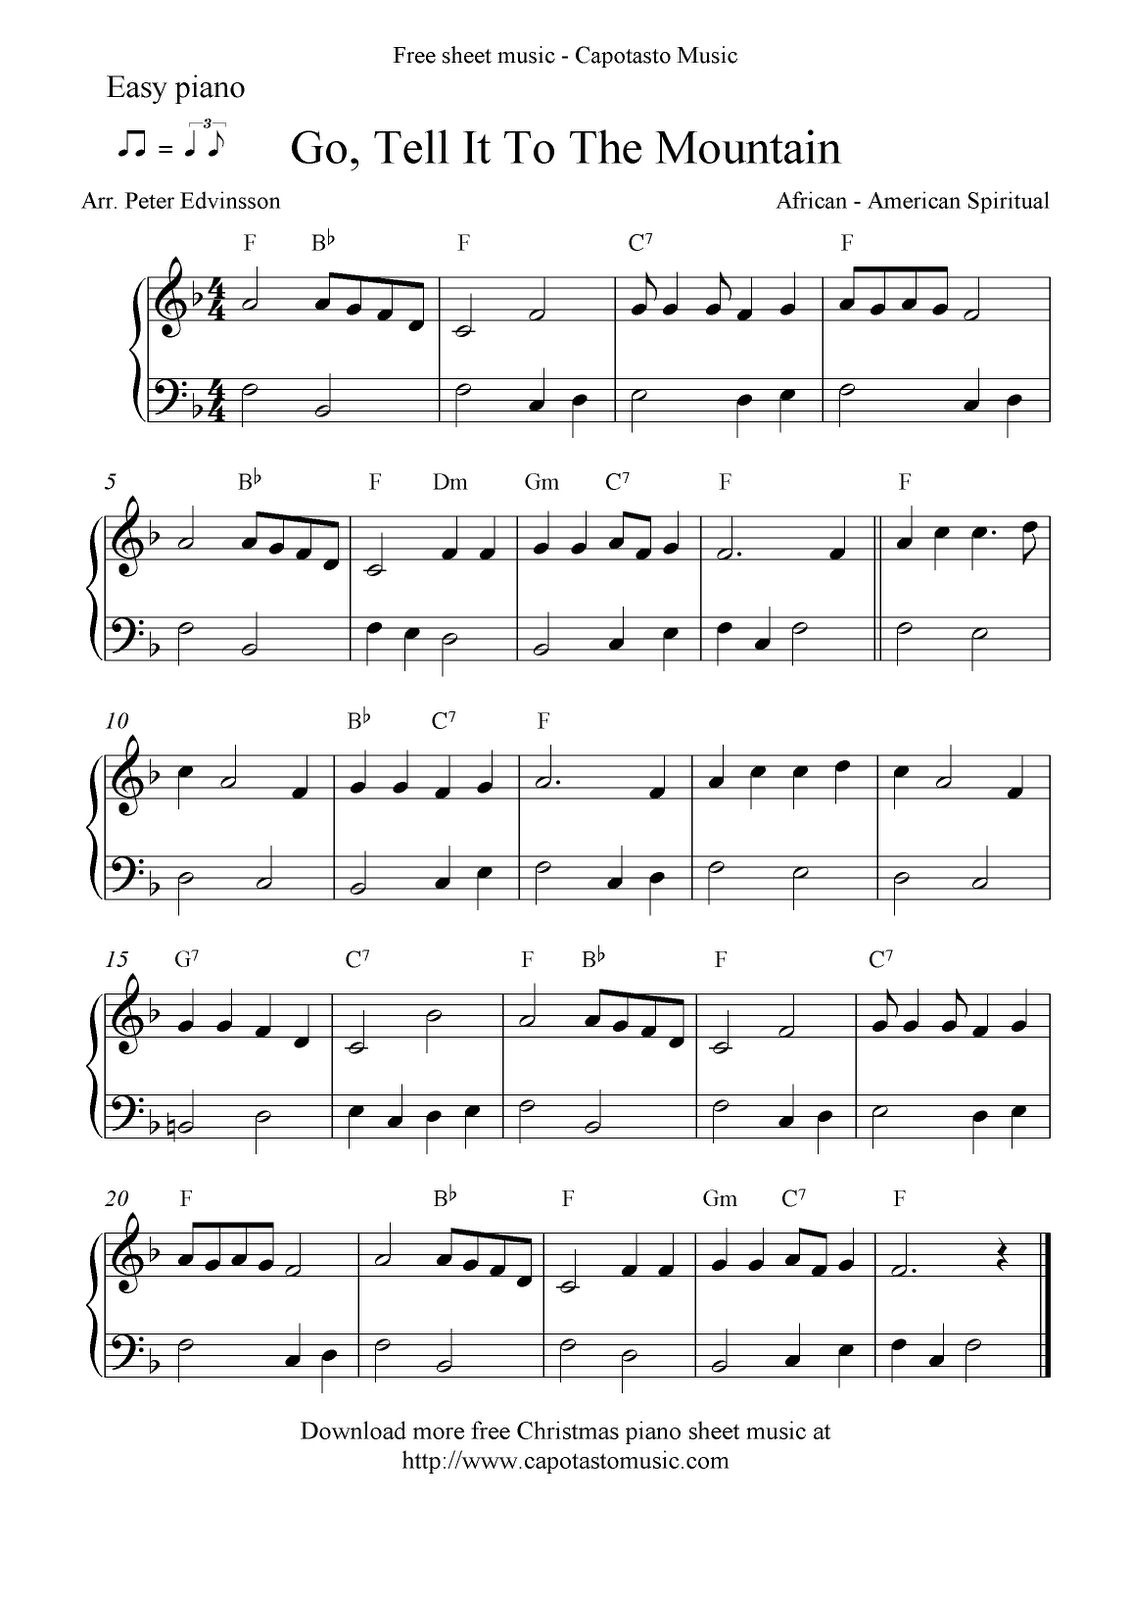 Free Printable Piano Sheet Music   Free Sheet Music Scores: Easy - Free Printable Christmas Sheet Music For Piano